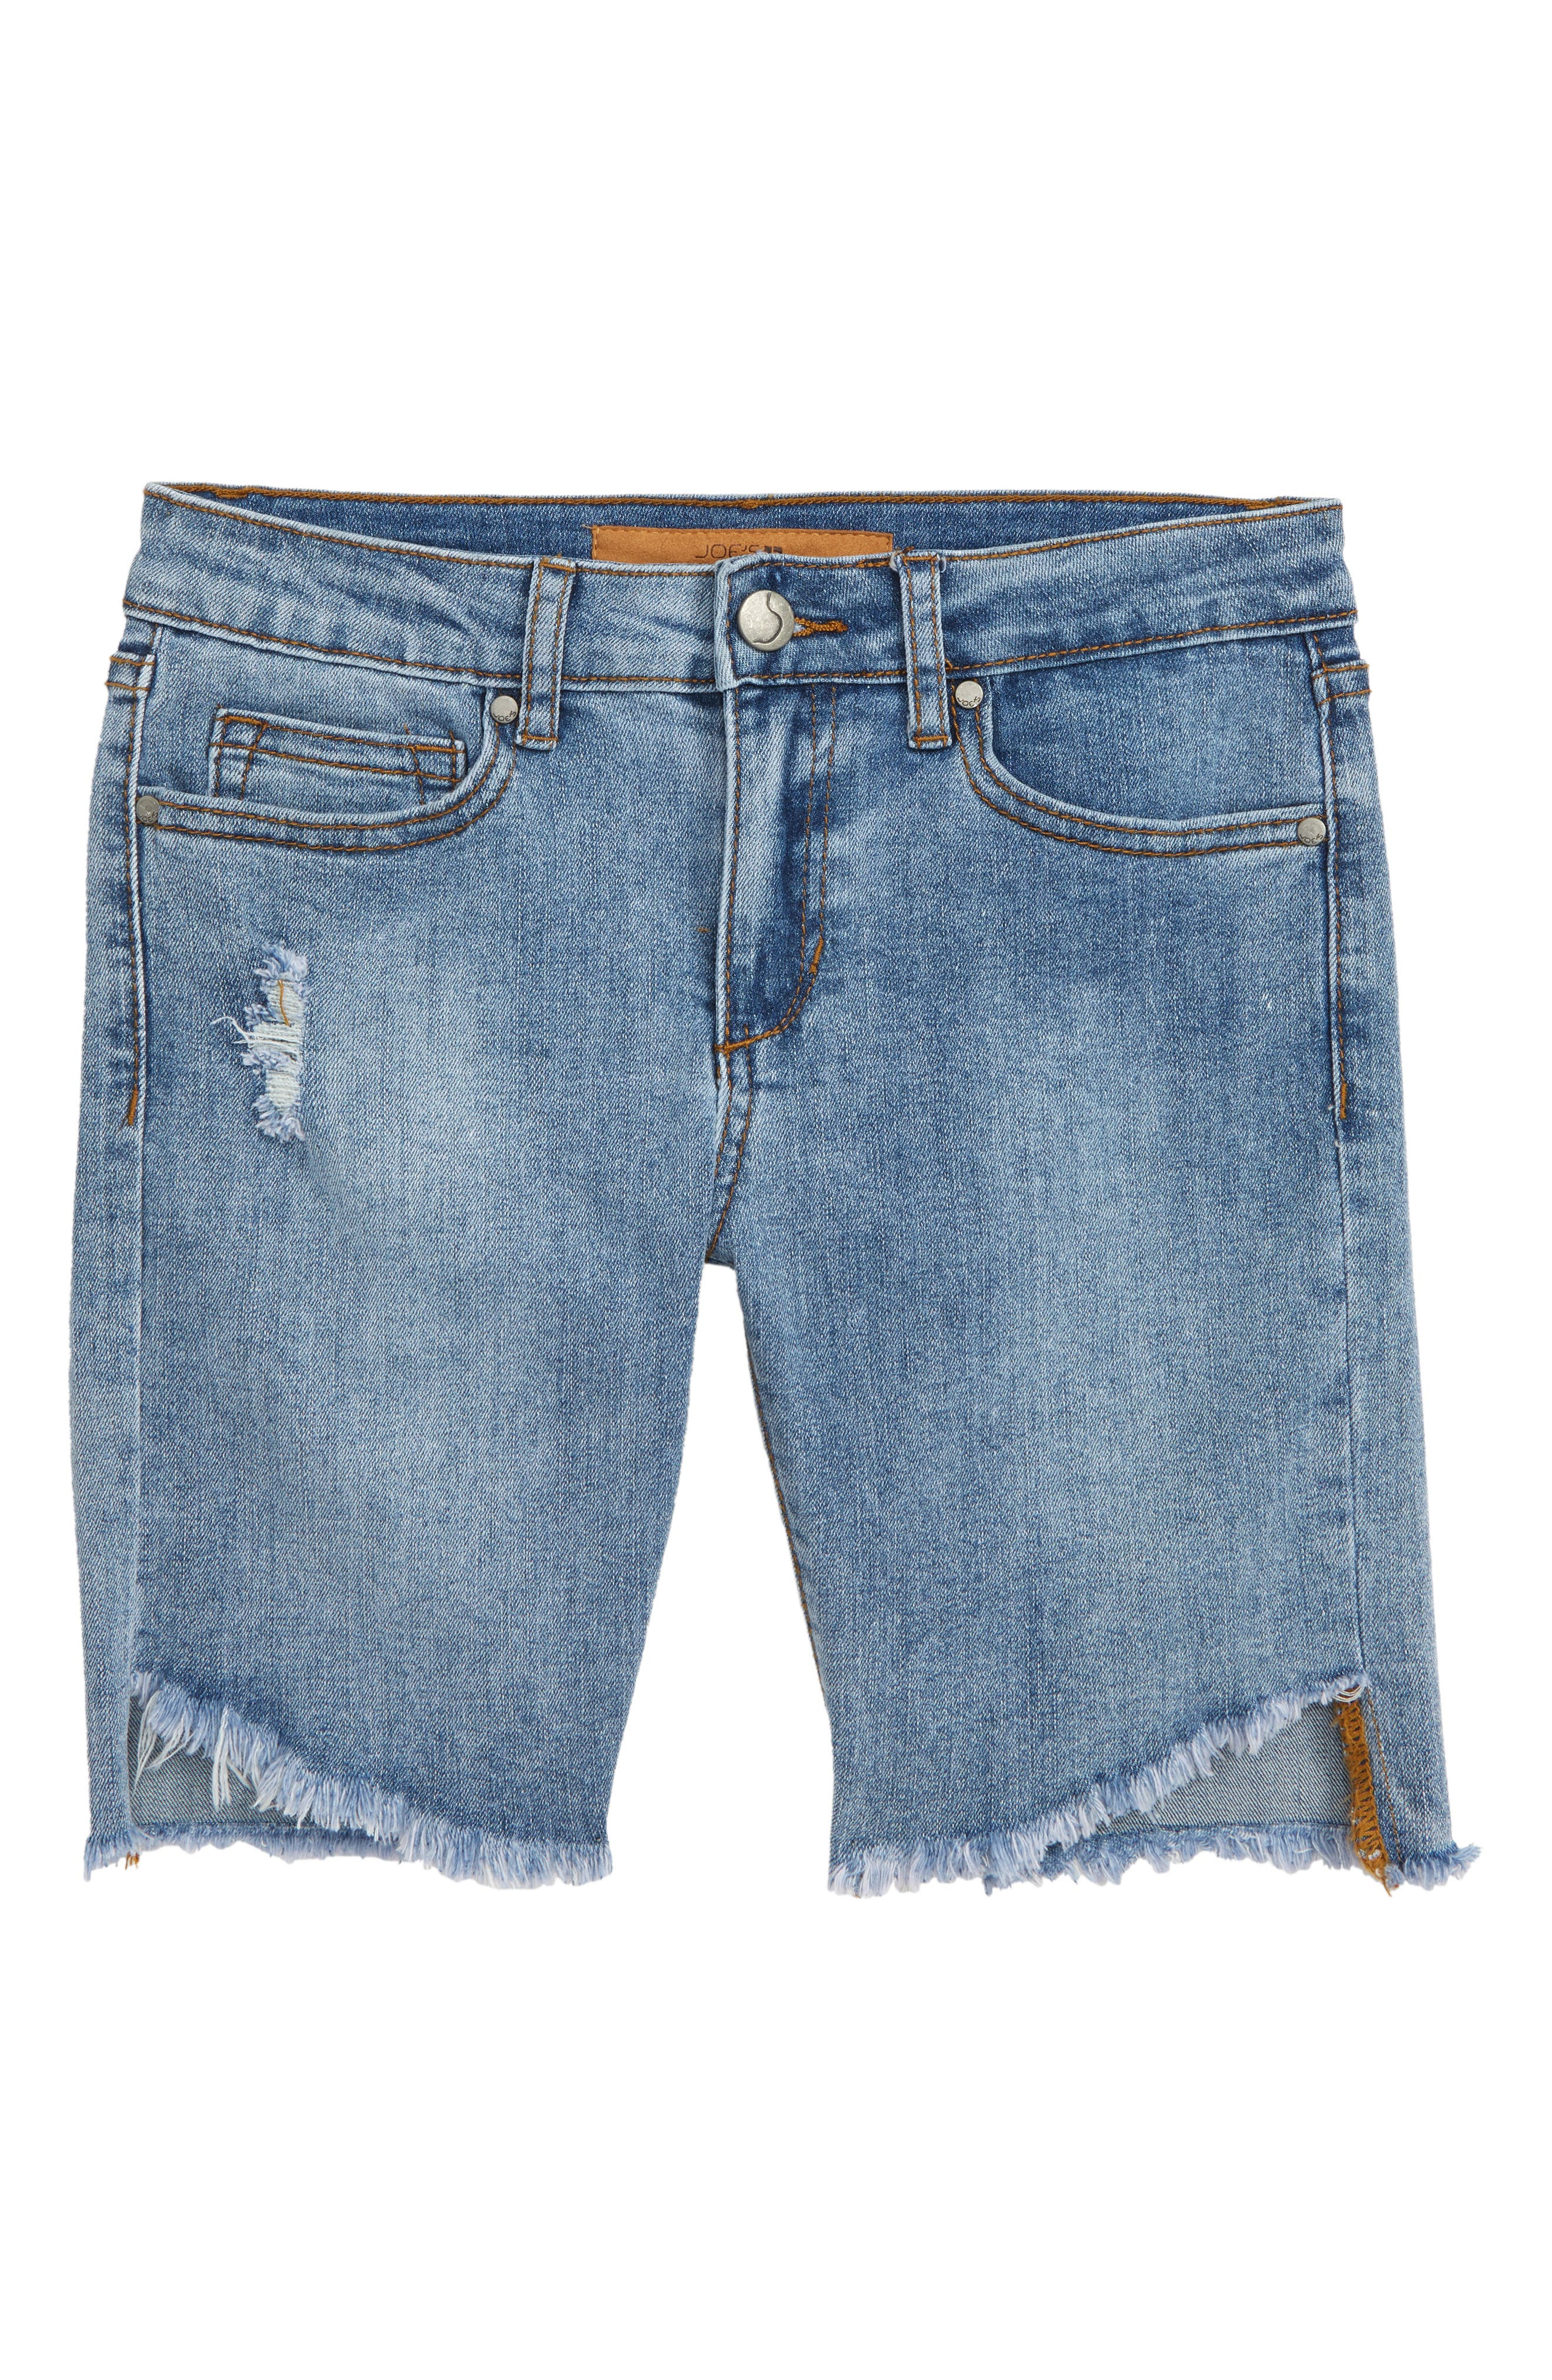 JOE'S, The Finn Cutoff Denim Bermuda Shorts, Main thumbnail 1, color, THOMPSON